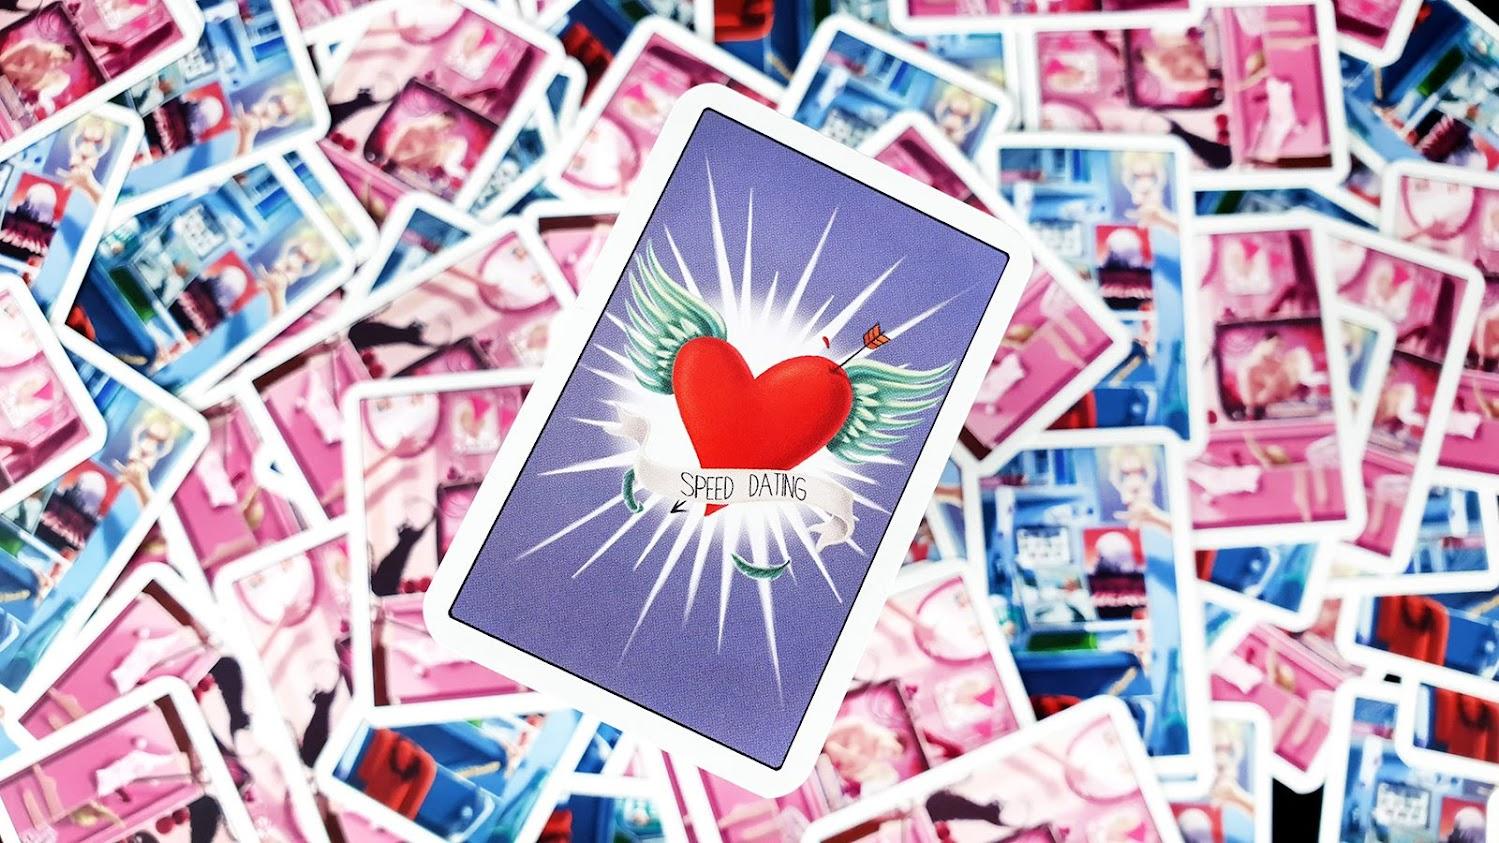 kto chodzi na speed dating Piszen dating horoskop